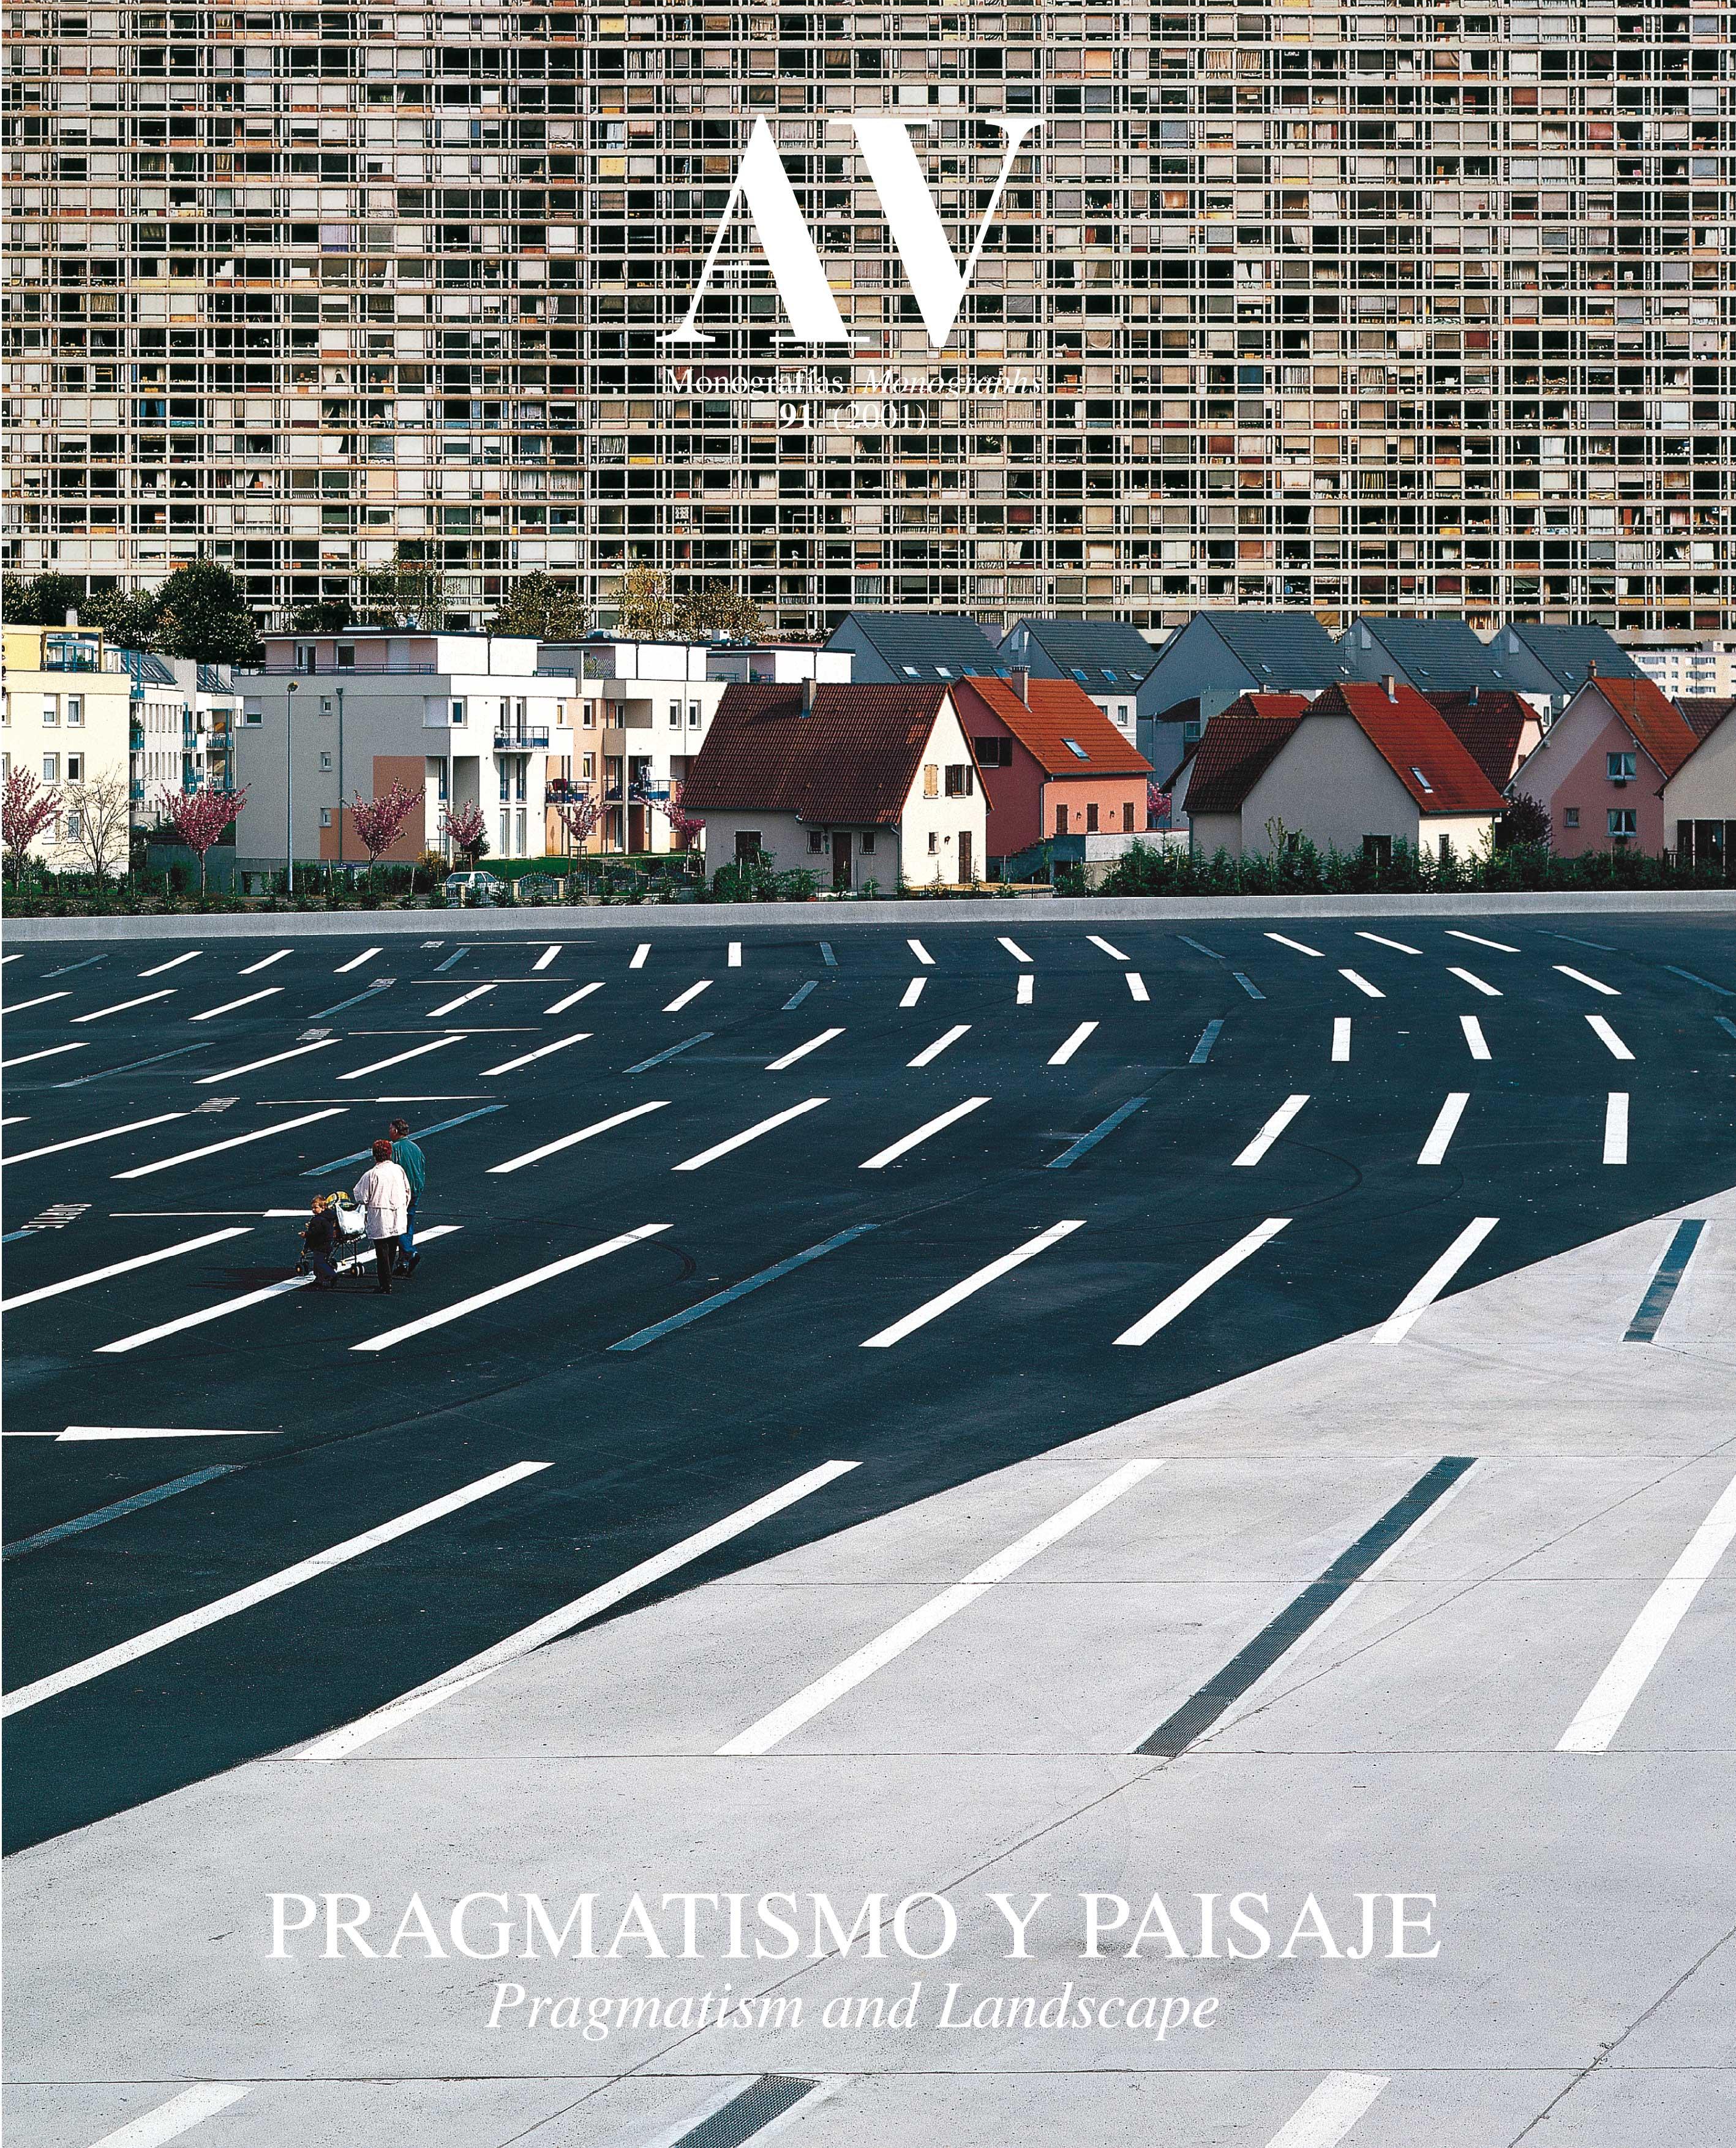 Pragmatismo y paisaje